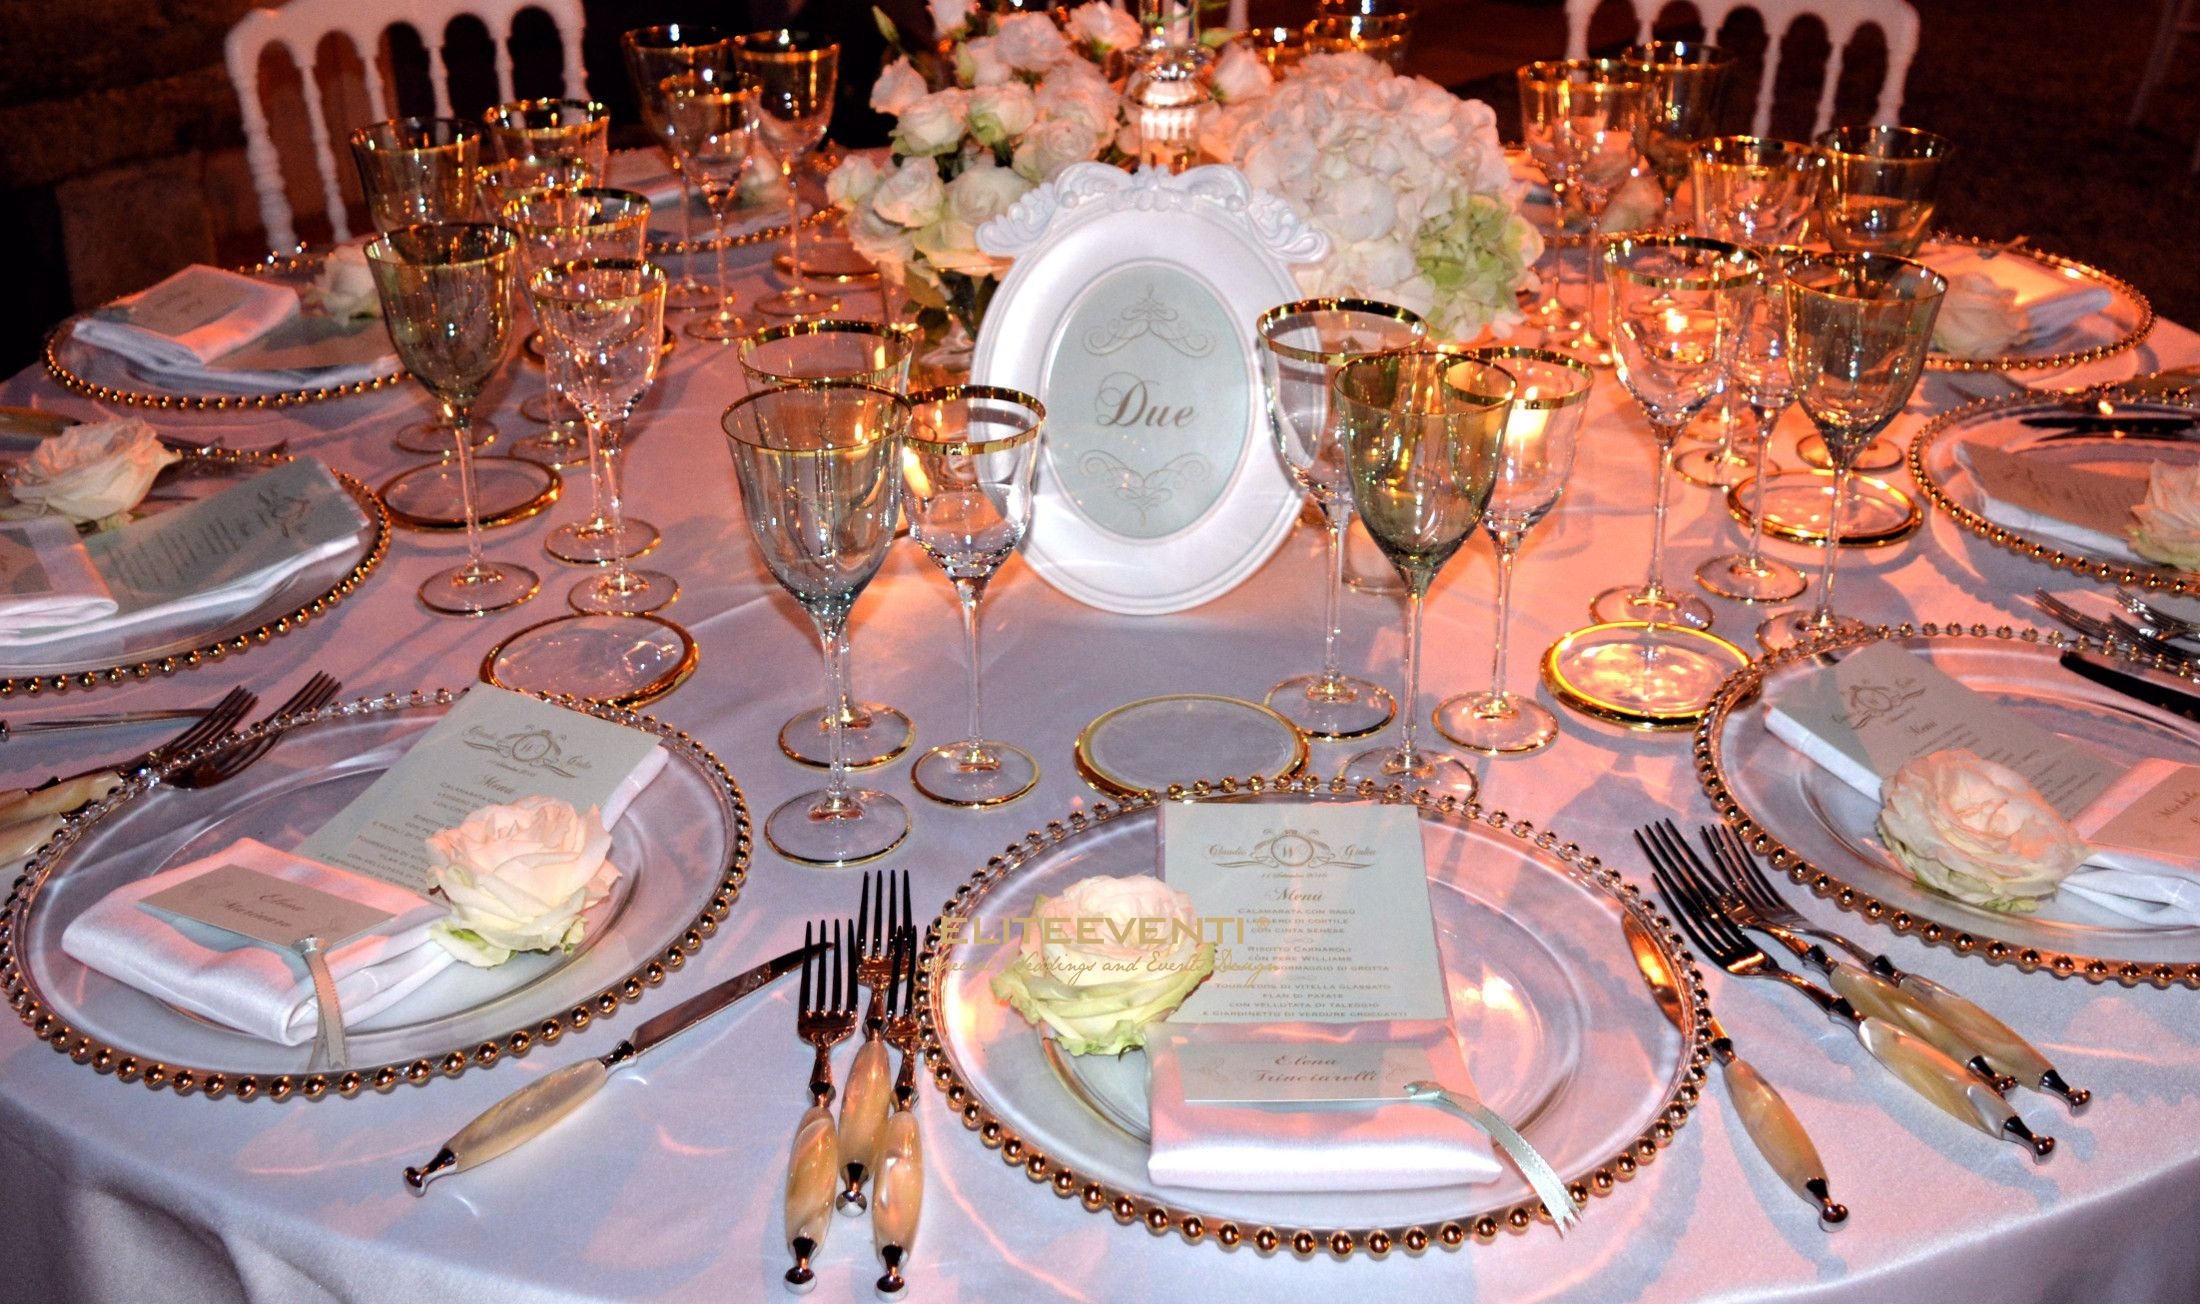 Tavolo_invitati_Charming_Wedding_by_Eliteeventi